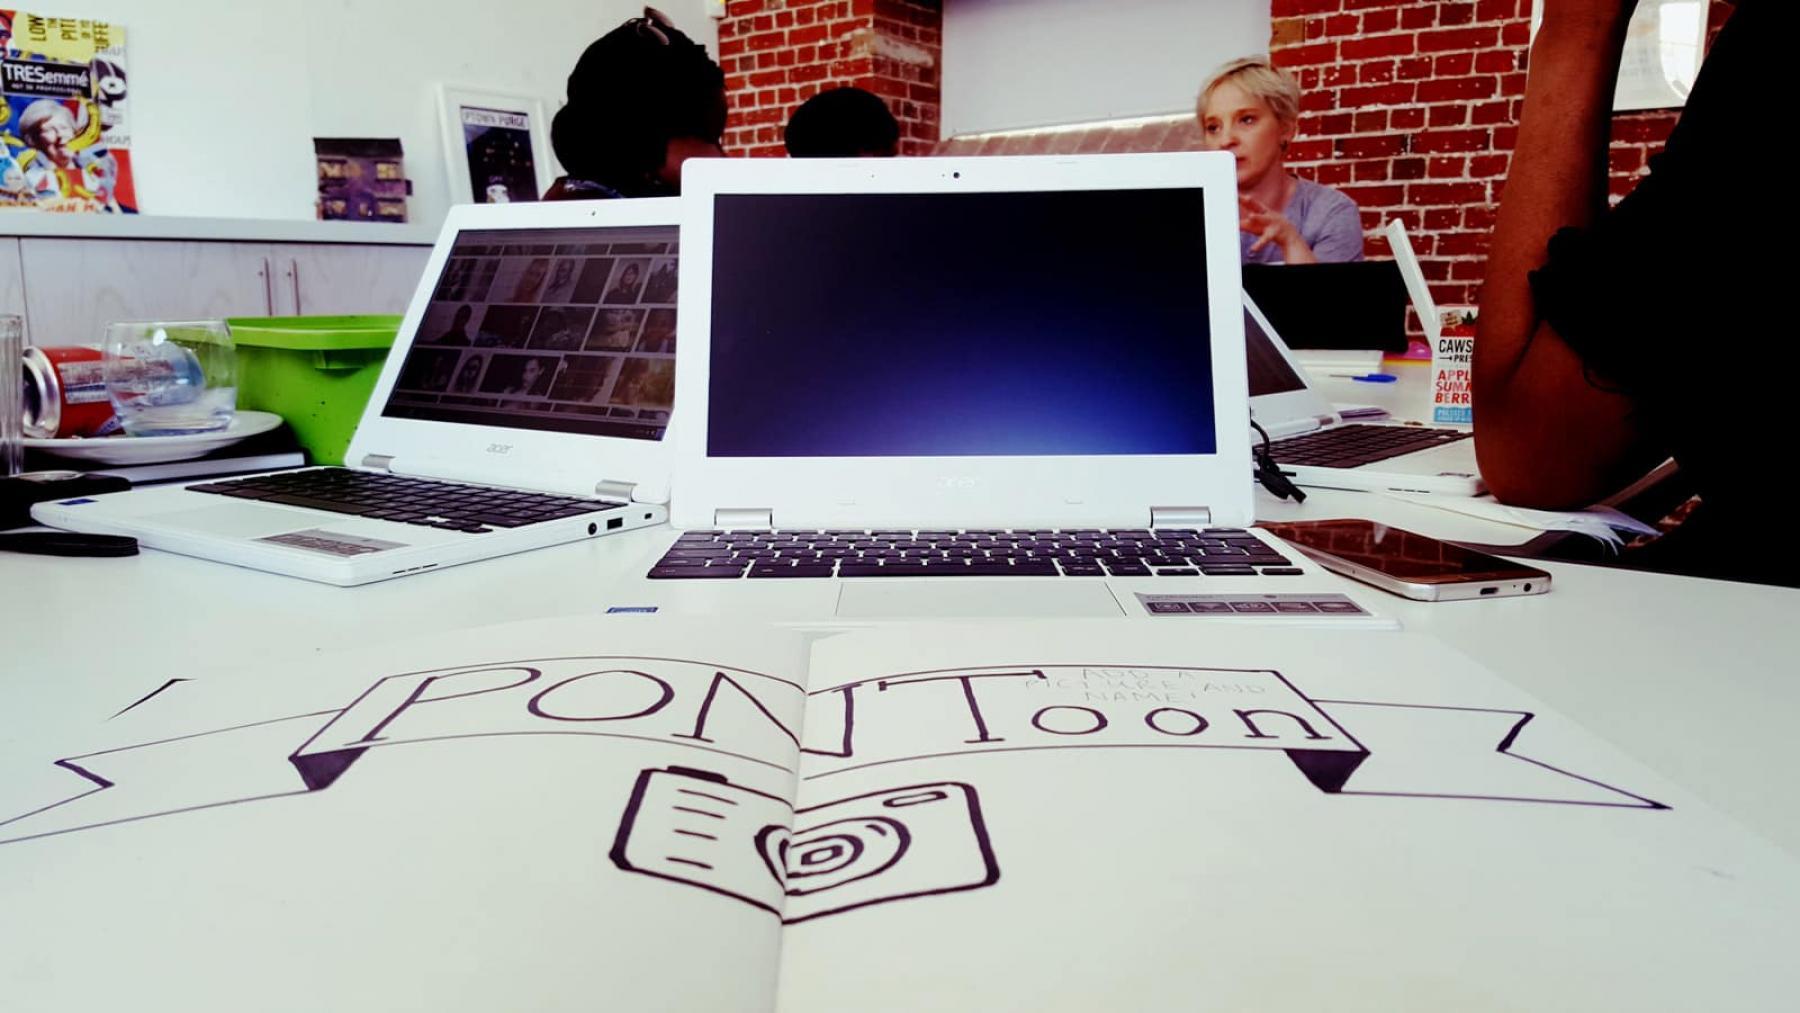 Aspex Gallery PONToon up-skilling workshop